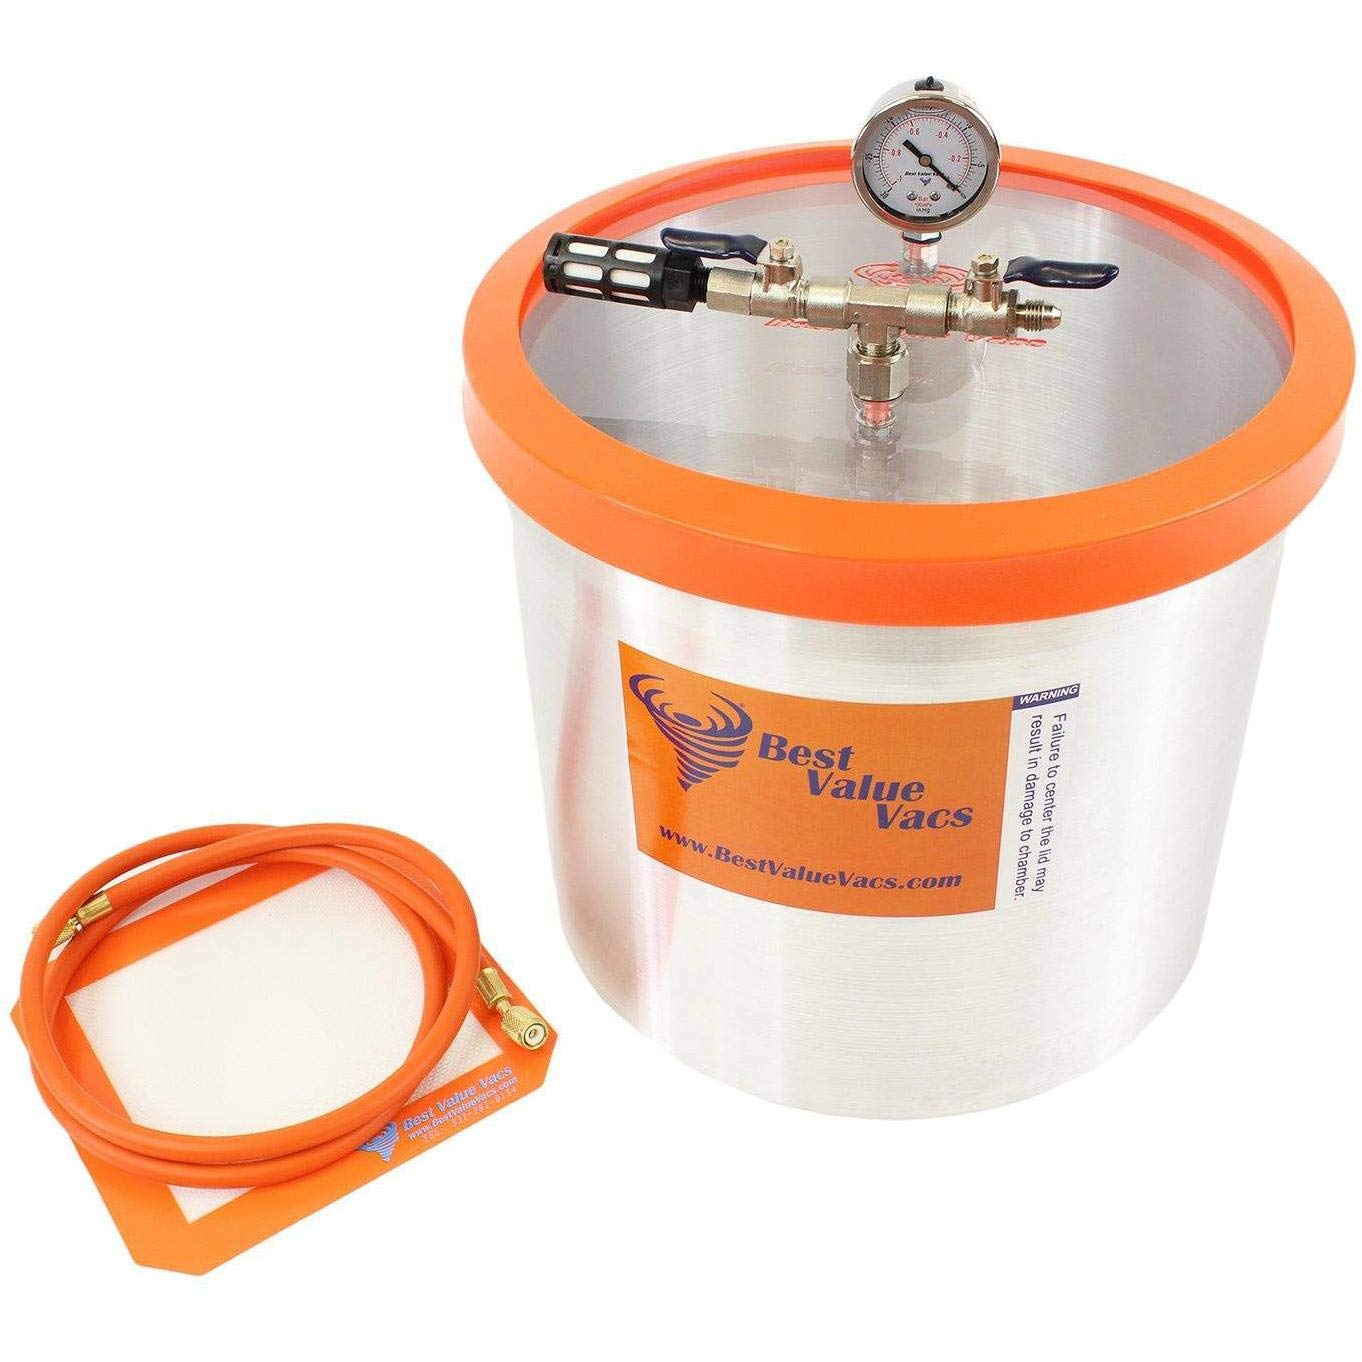 Best Value Vacs 5 Gallon Aluminum Vacuum Chamber